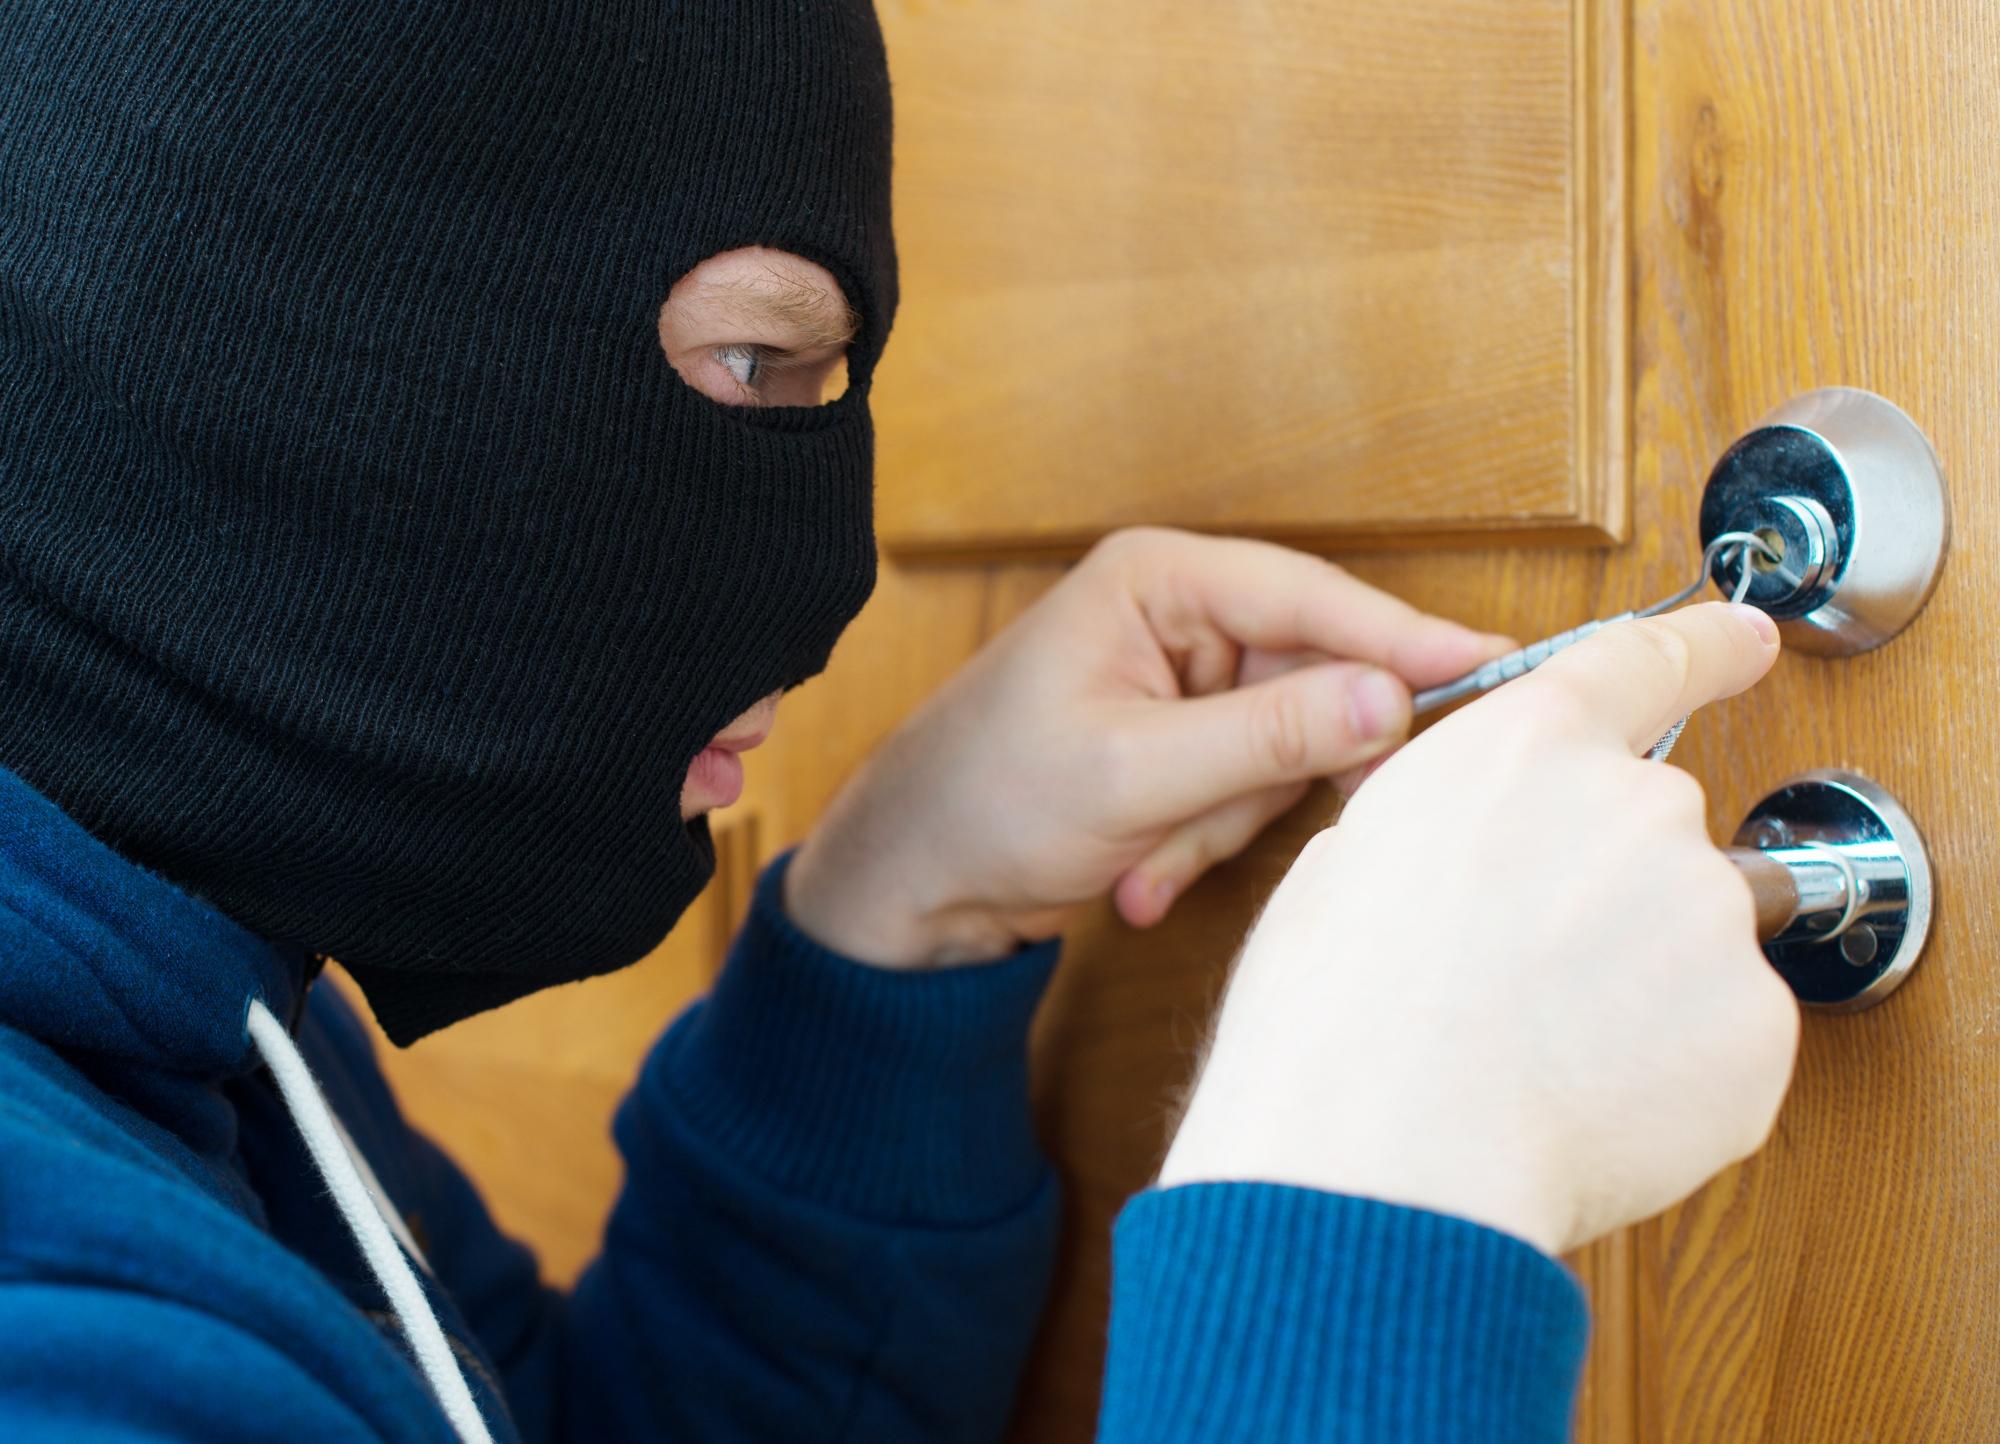 Techniques used by burglars - Verisure Blog